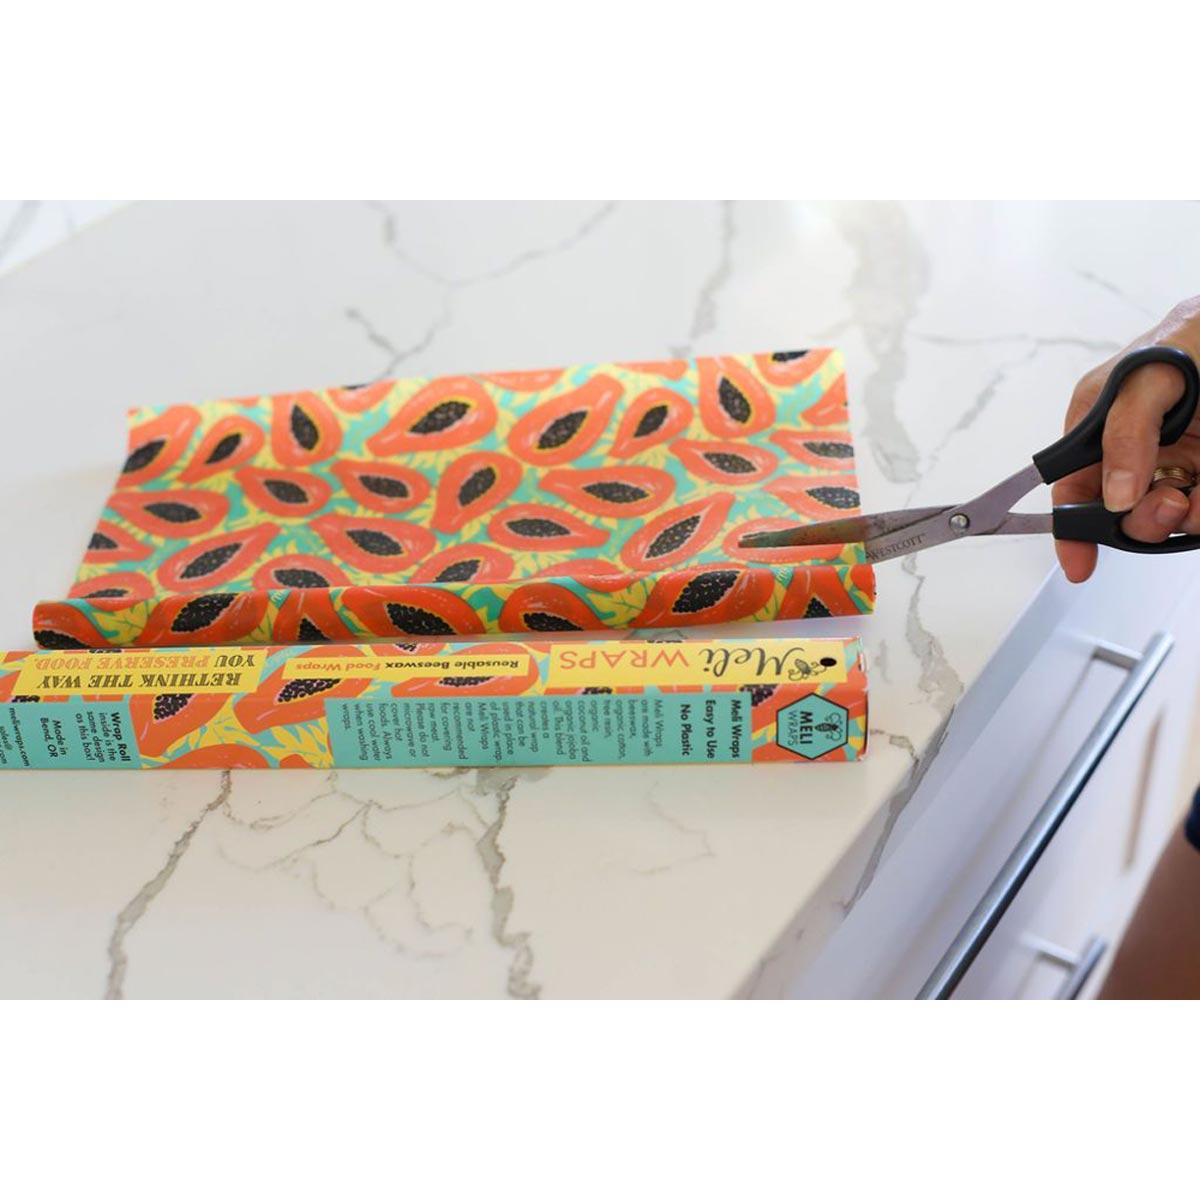 Meli Wraps Bulk Roll (42 in. x 13.5 in.) Reusable Beeswax Food Wrap, Tropical Papaya Print